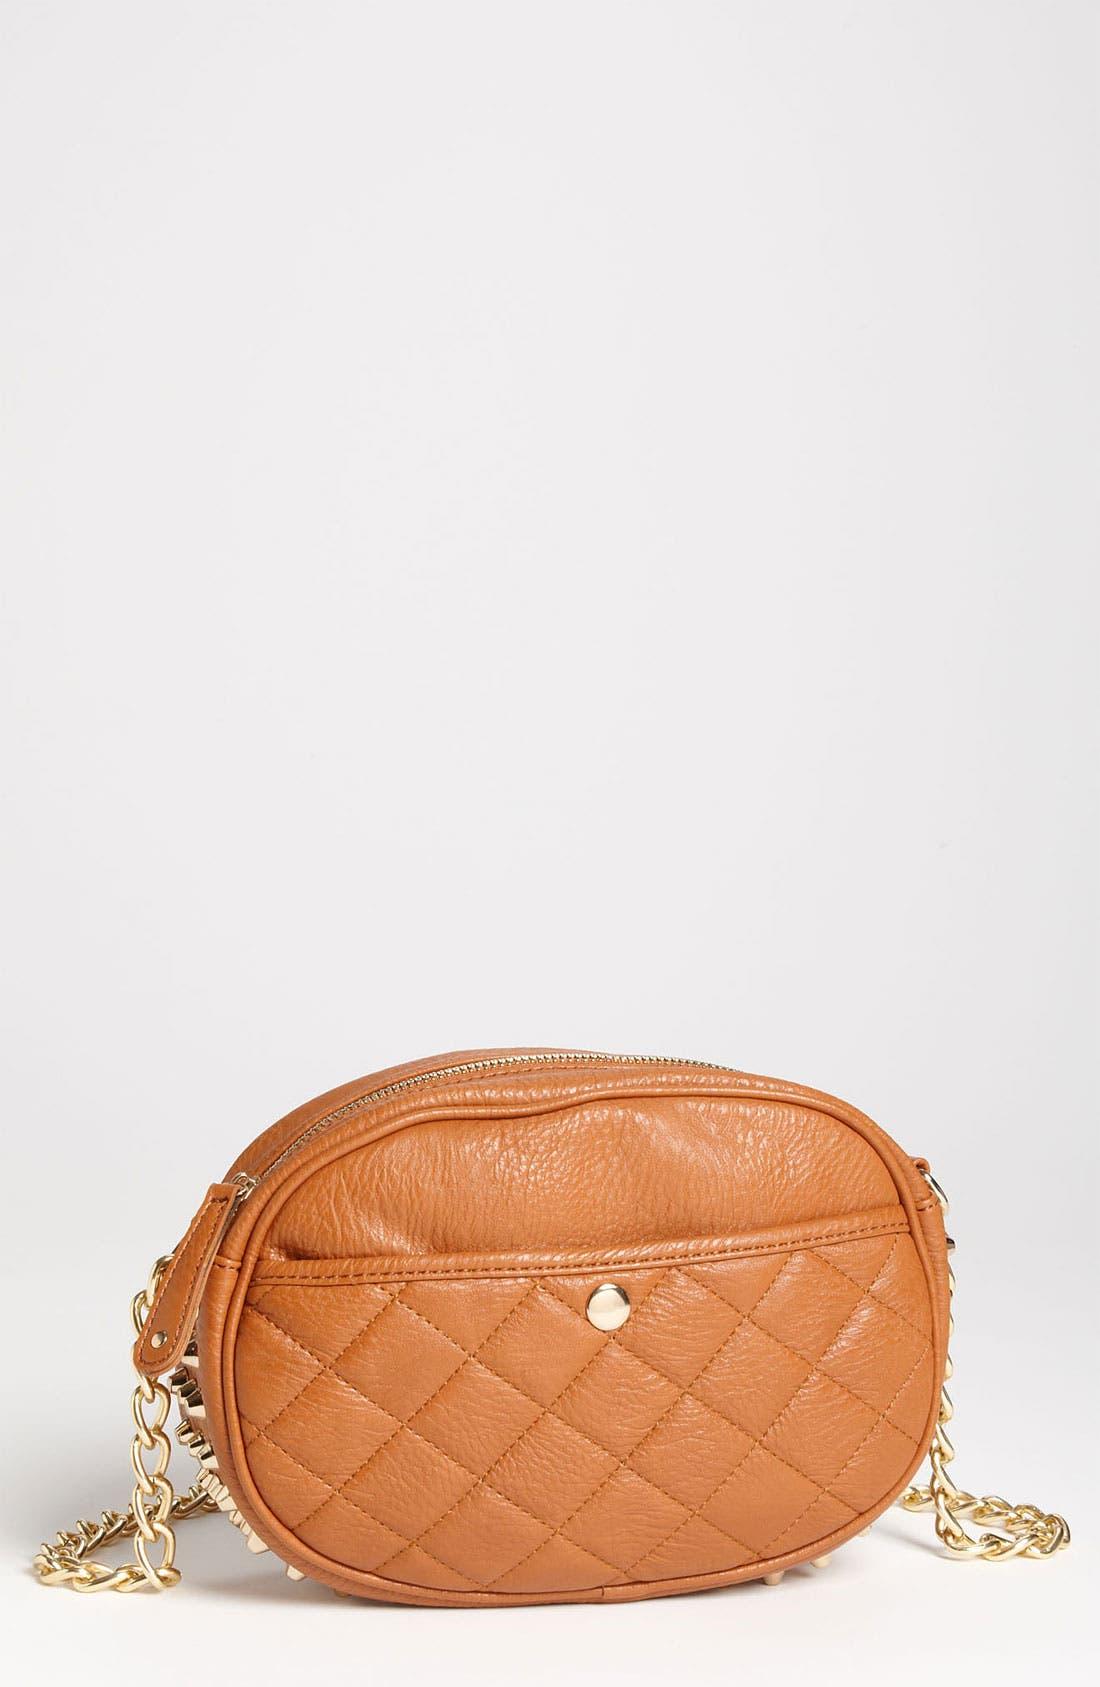 Alternate Image 1 Selected - Street Level Studded Crossbody Bag